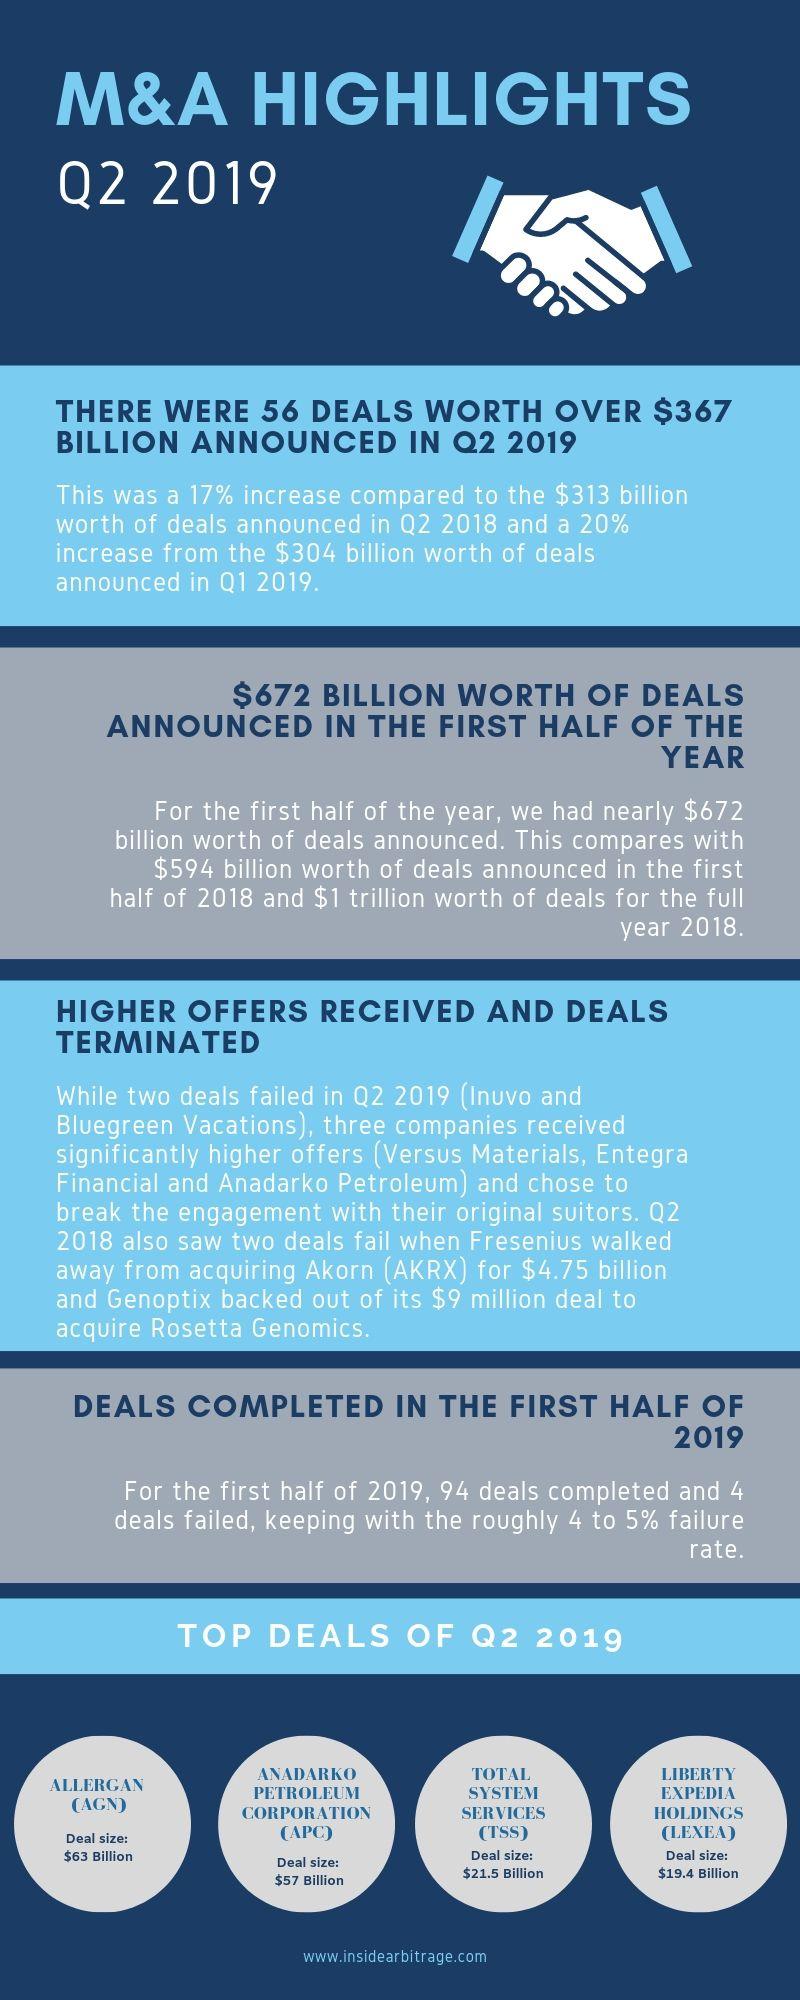 Q2 2019 U.S. M&A Highlights